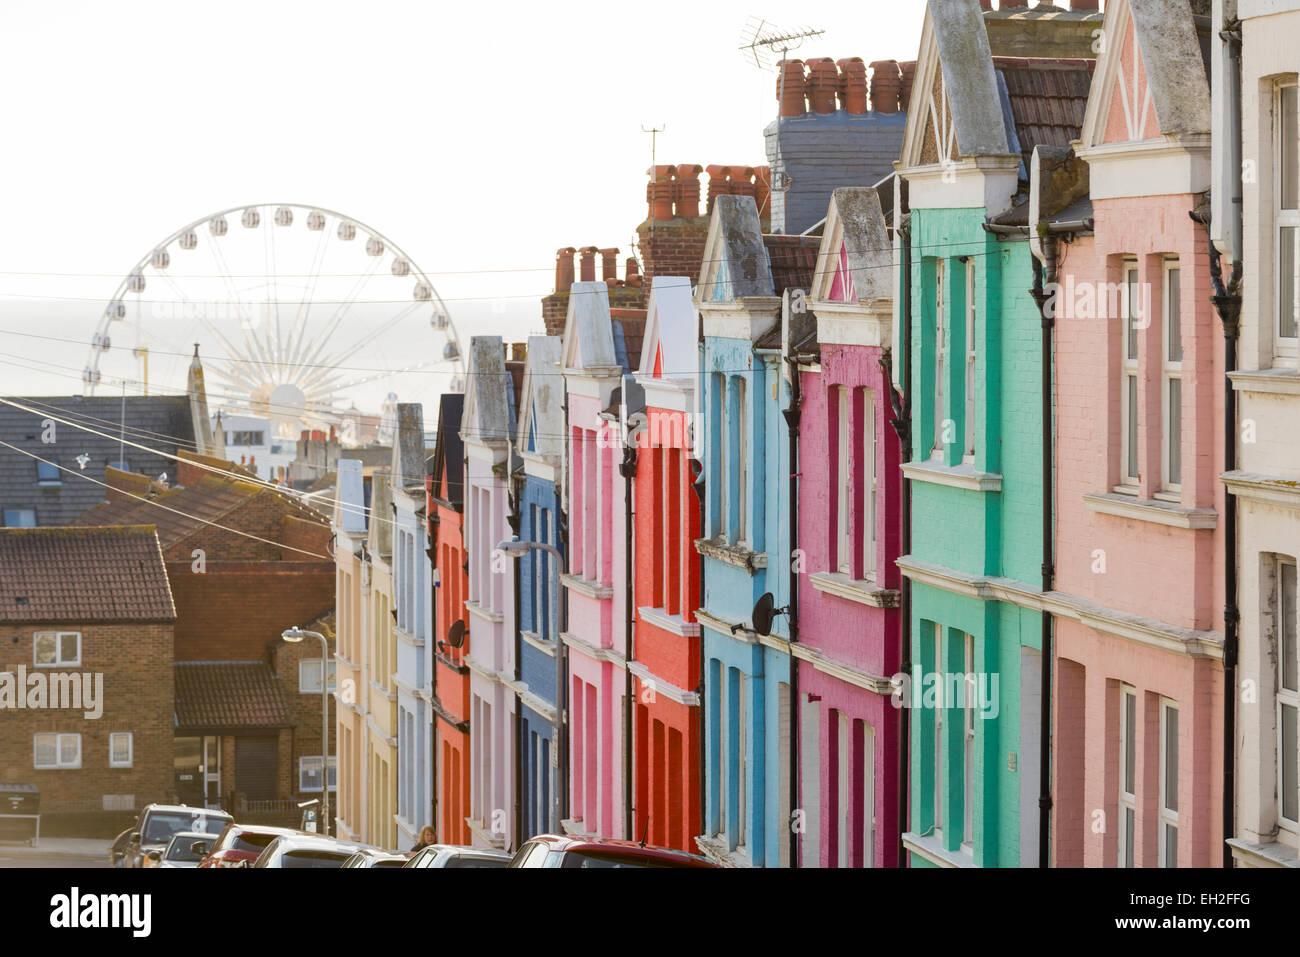 Fila de coloridas casas pintadas en Brighton, East Sussex, Inglaterra, Reino Unido. Imagen De Stock